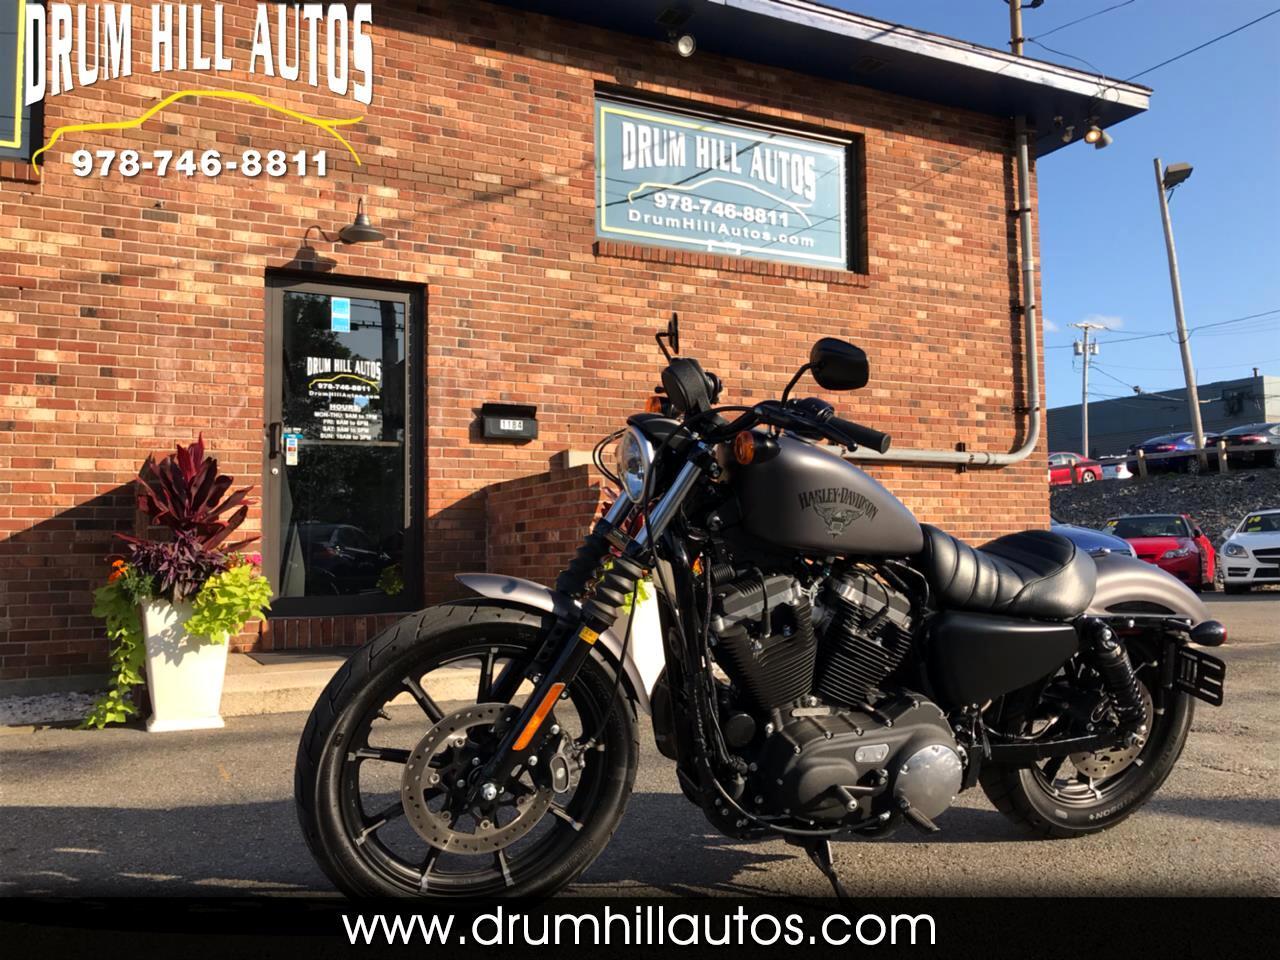 2016 Harley-Davidson XL883N